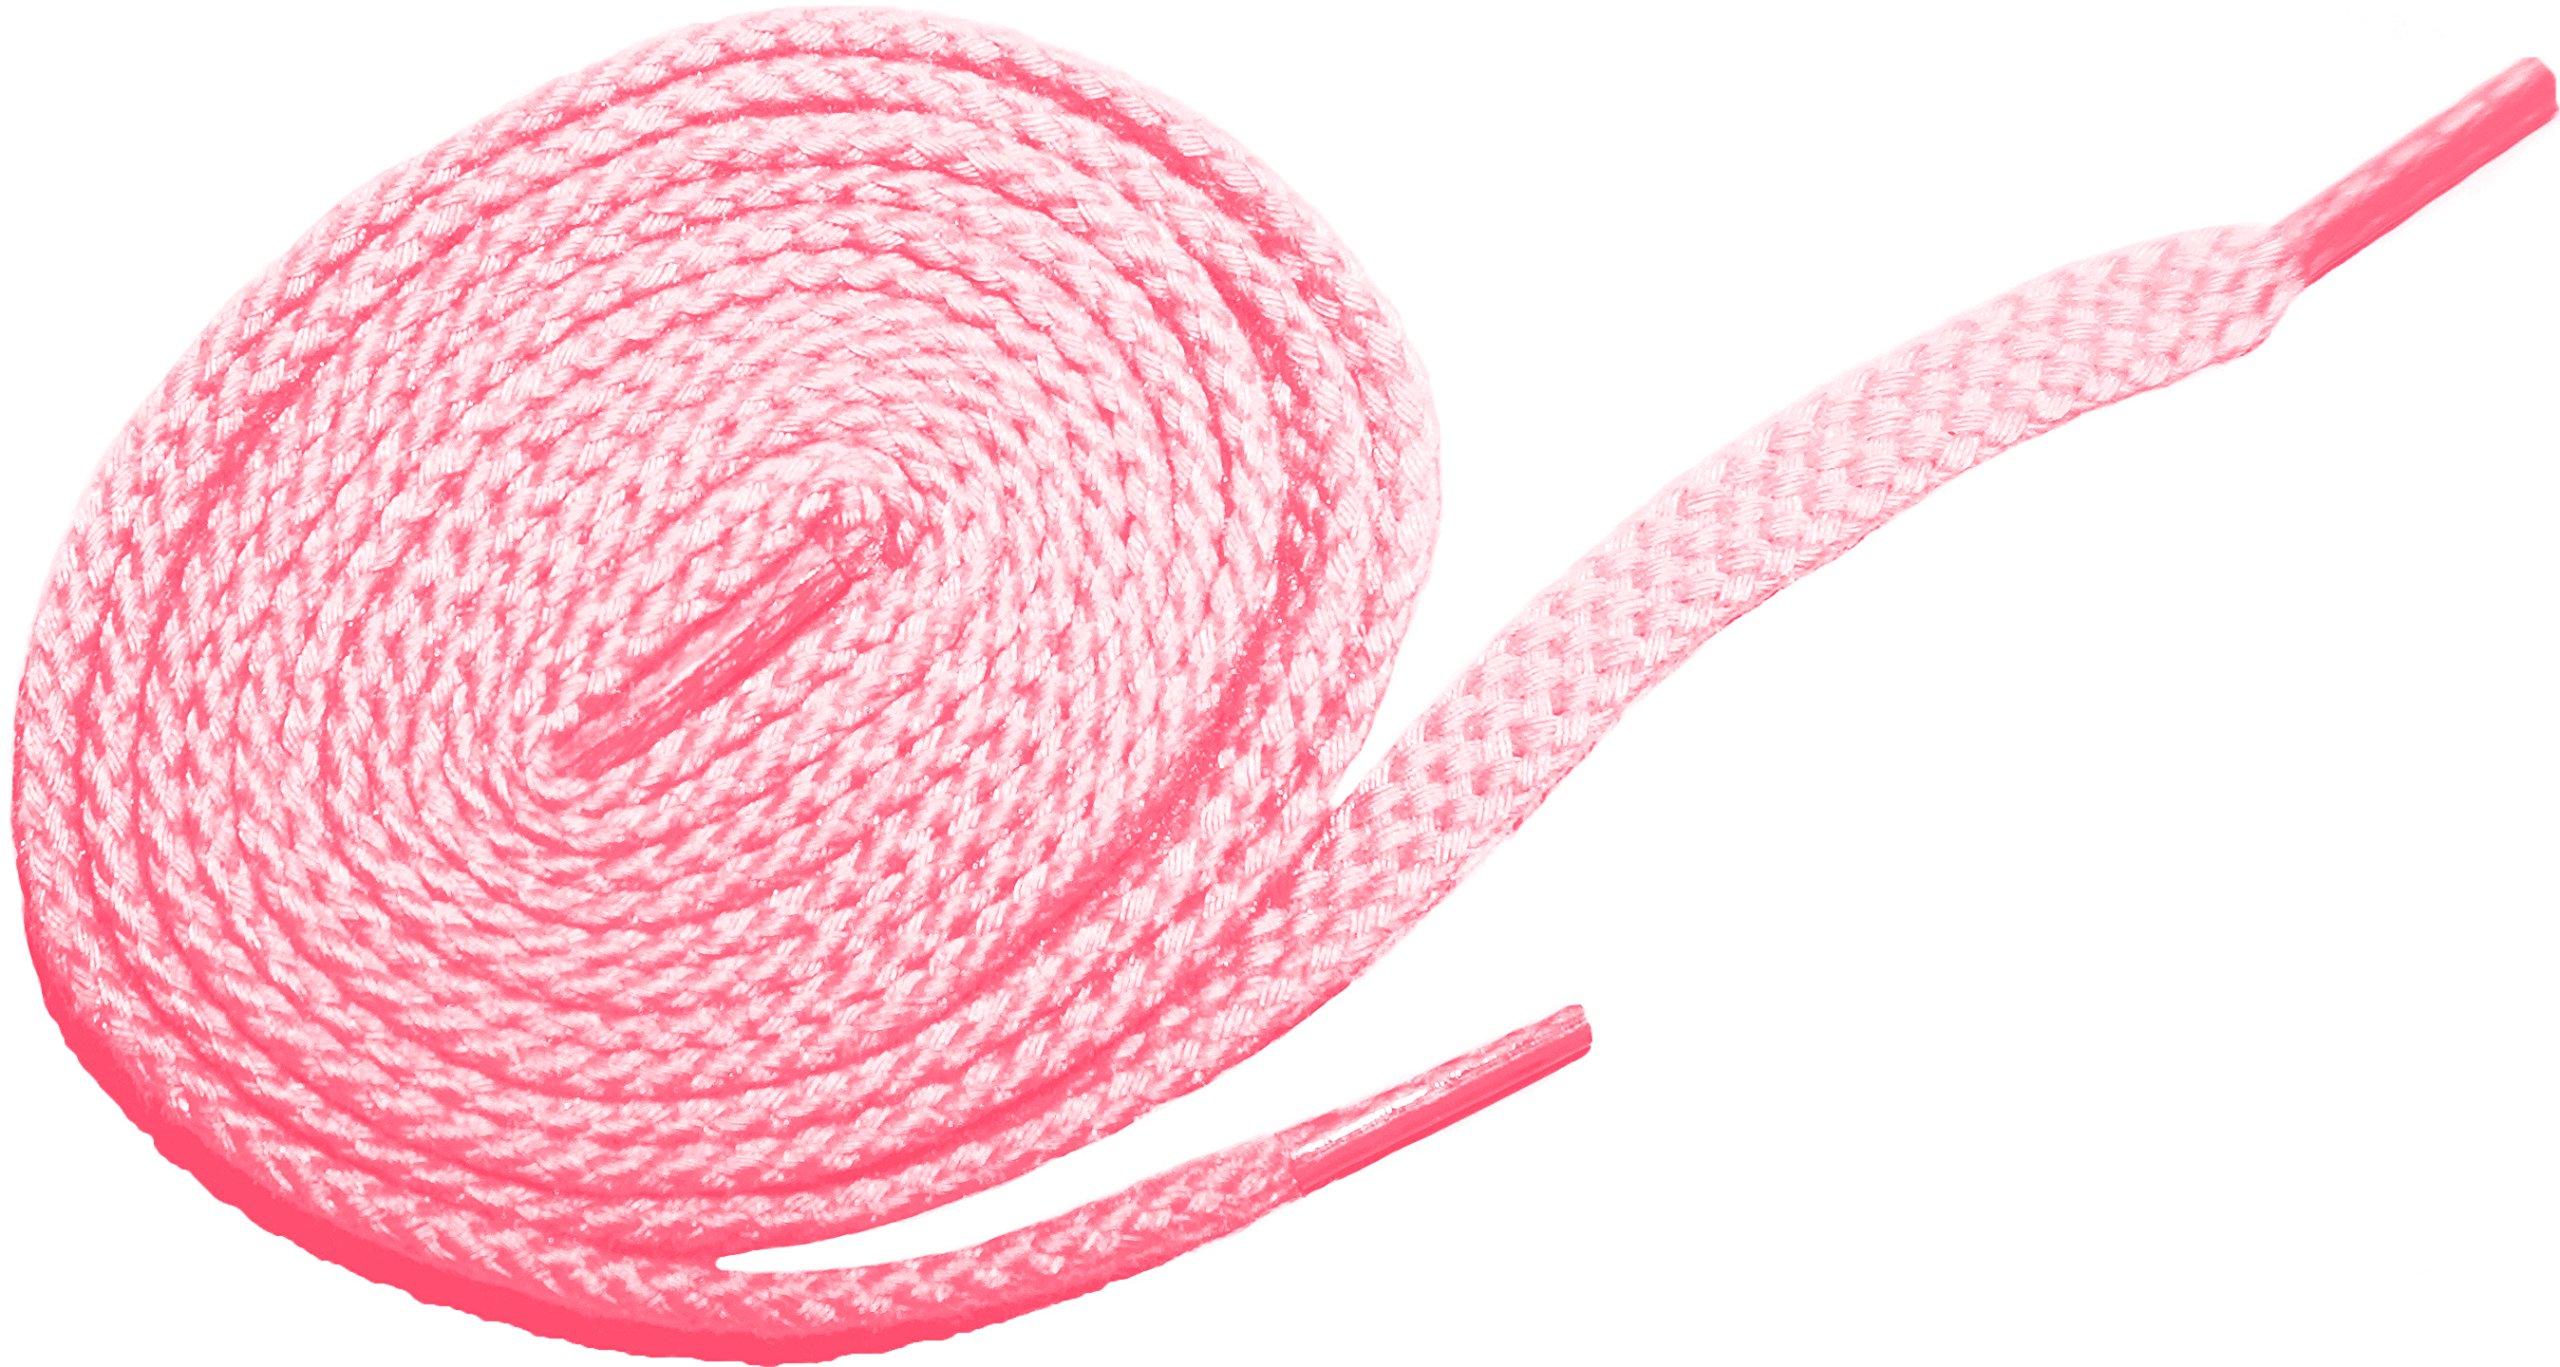 Shoeslulu 20'' Premium Oxfords Chukka Desert Boot Flat Canvas Shoelaces (19.5 in. (50 cm), Cherry Pink) by Shoeslulu (Image #1)